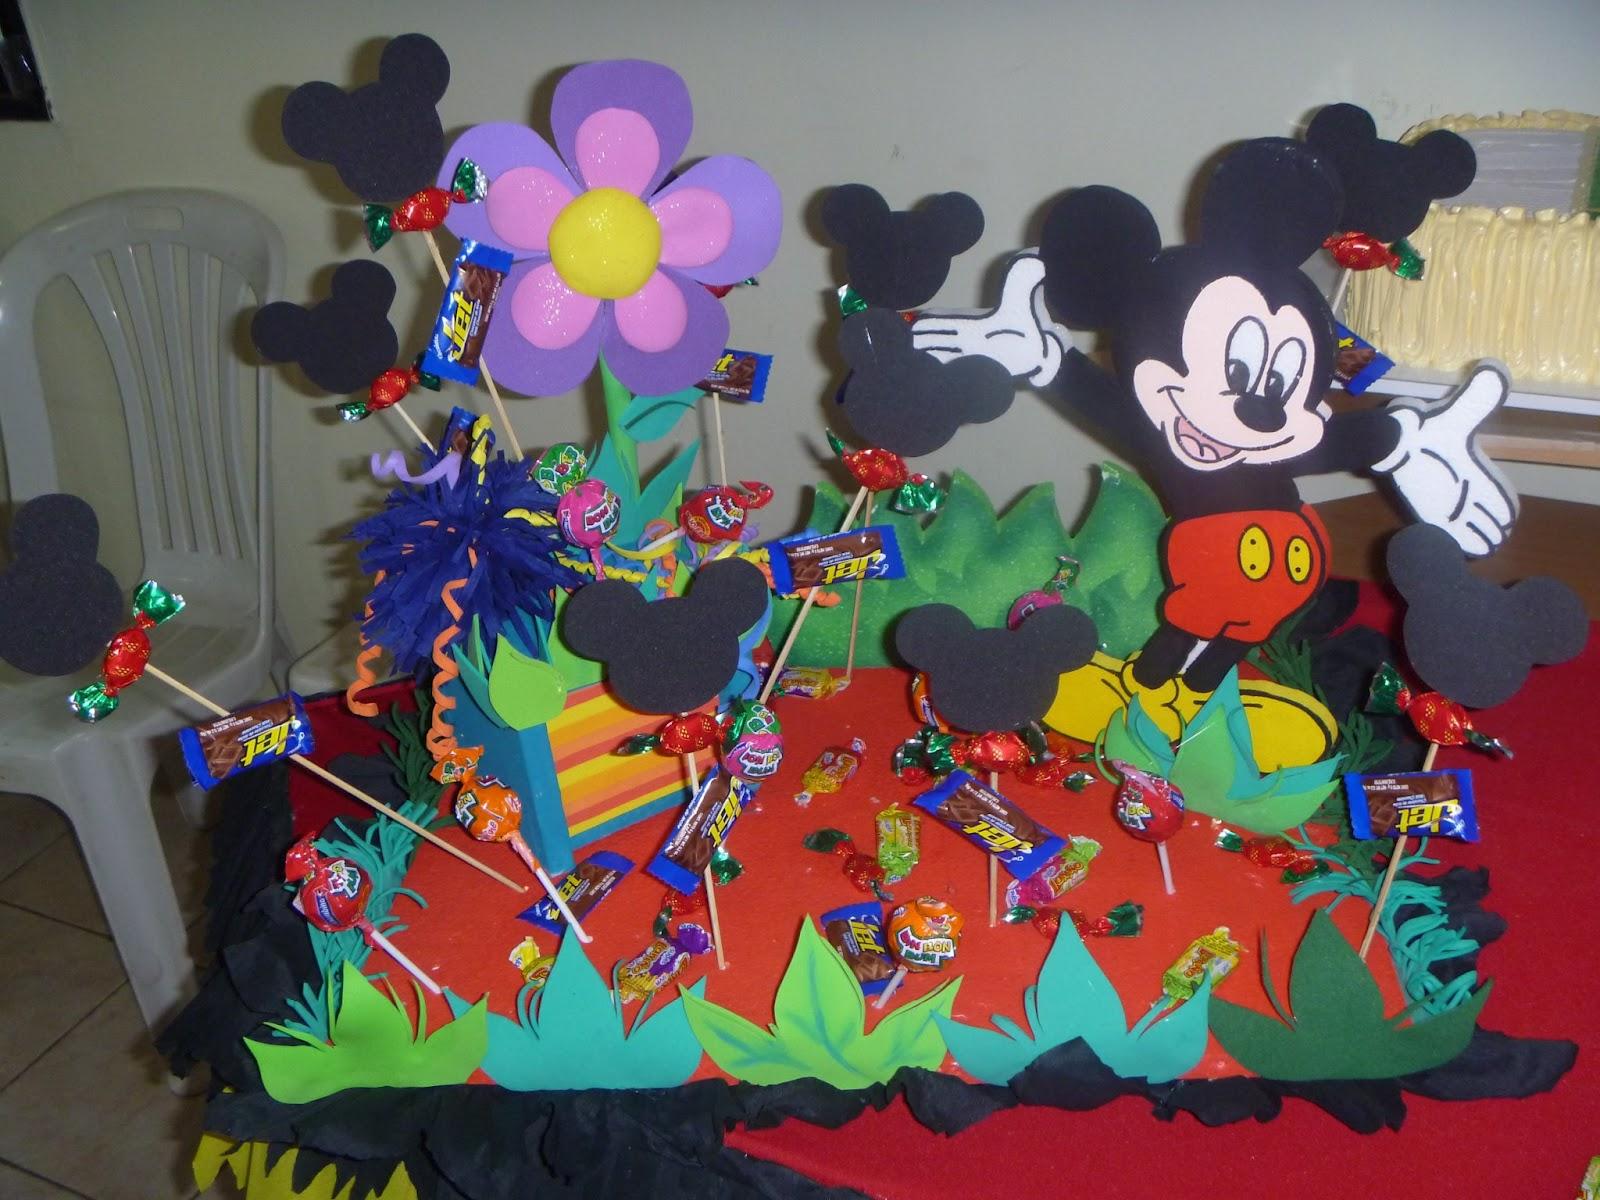 Decoracion Cumplea?os Mickey ~ Publicado por Cristina en 19 12 7 comentarios